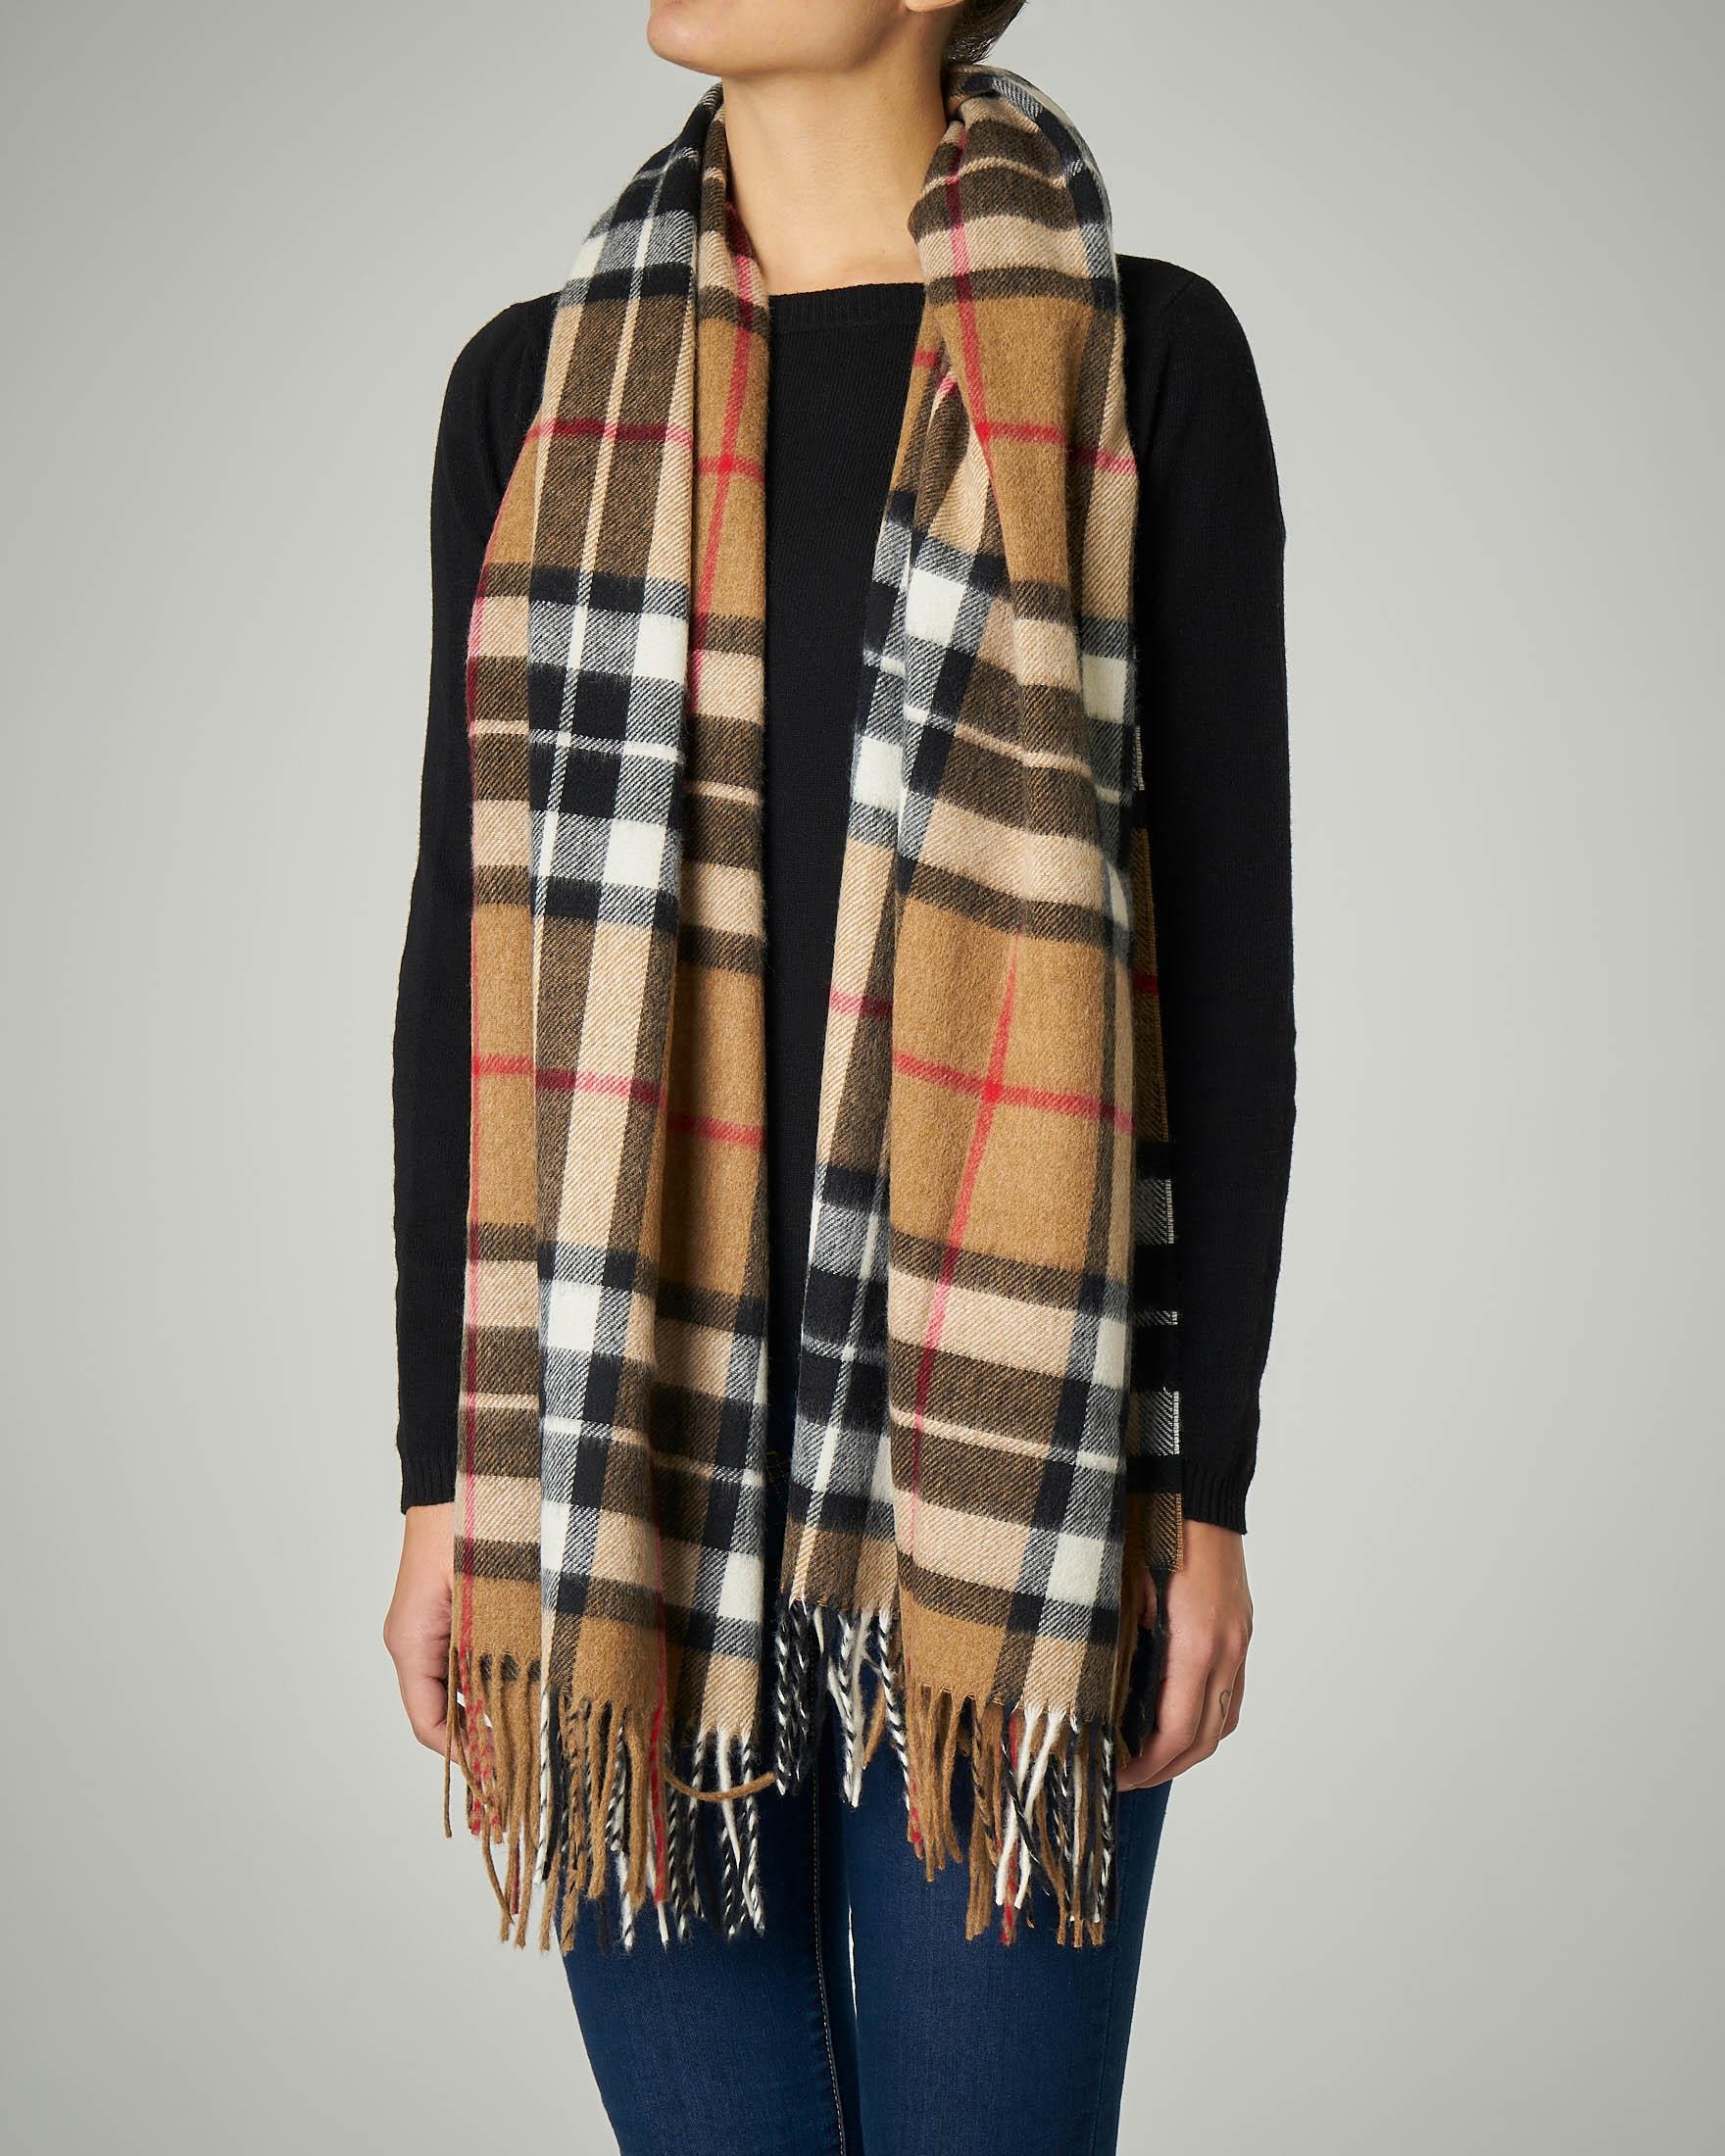 Sciarpa in lana merino a fantasia tartan cammello con frange